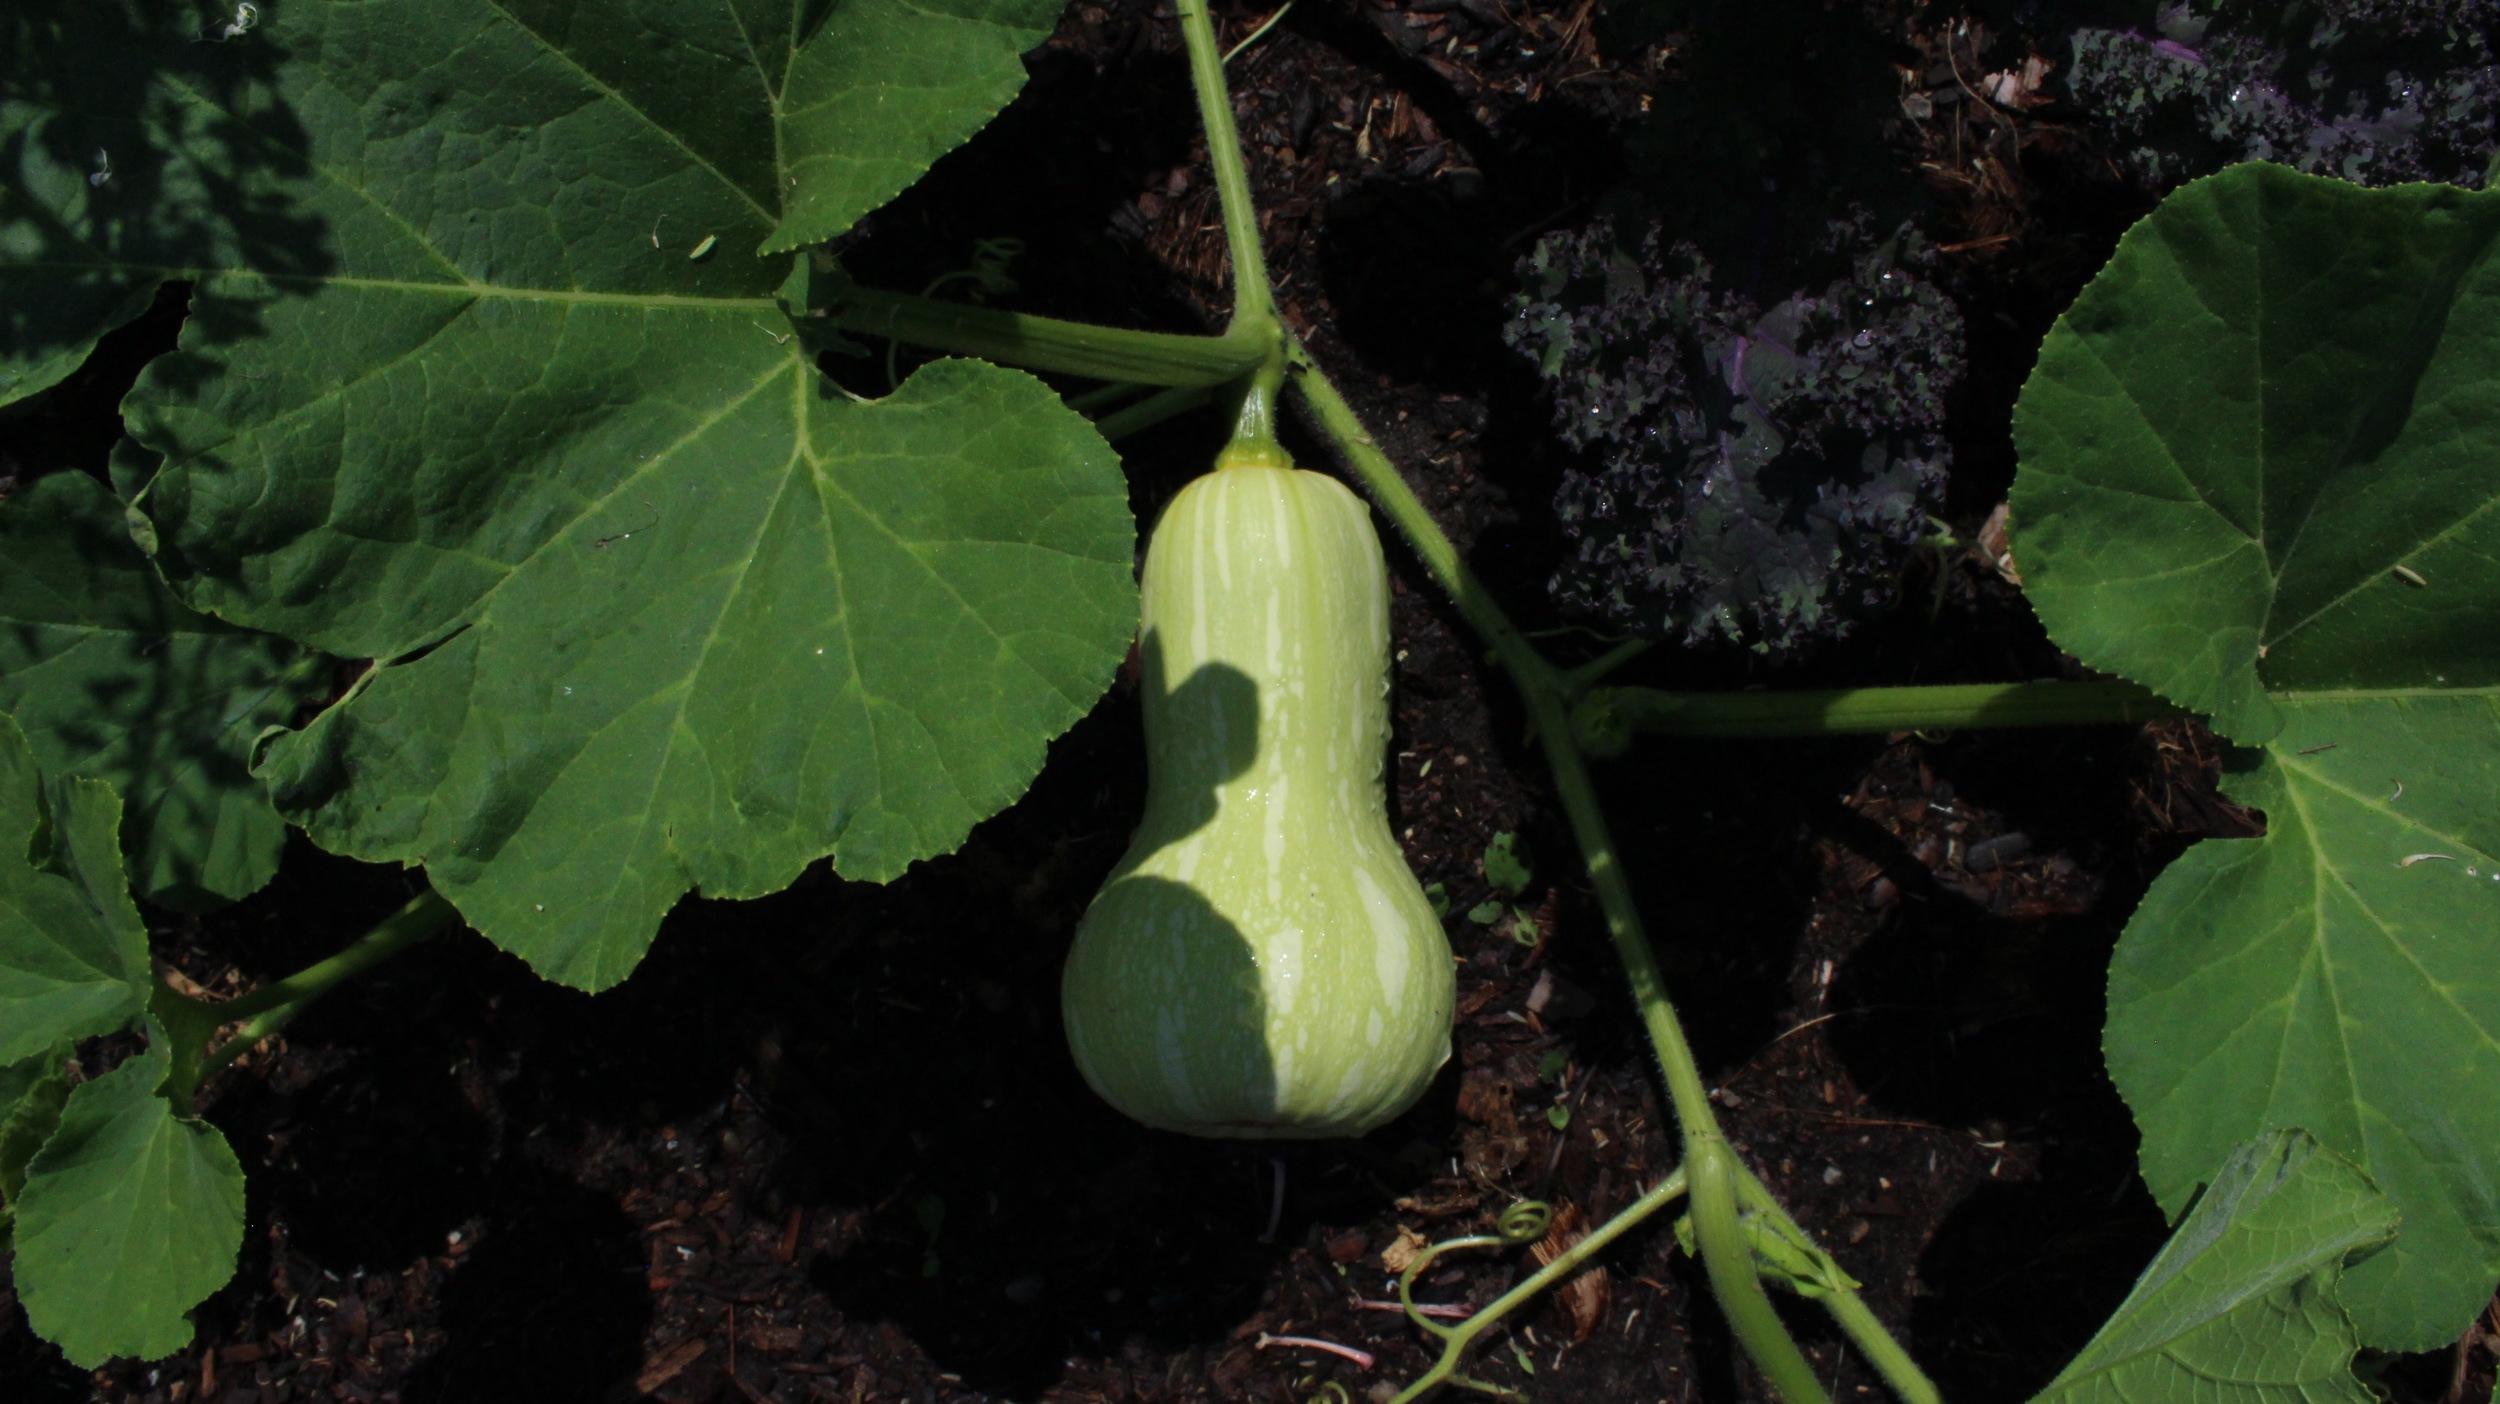 A lil butternut squash, not yet ripe enough